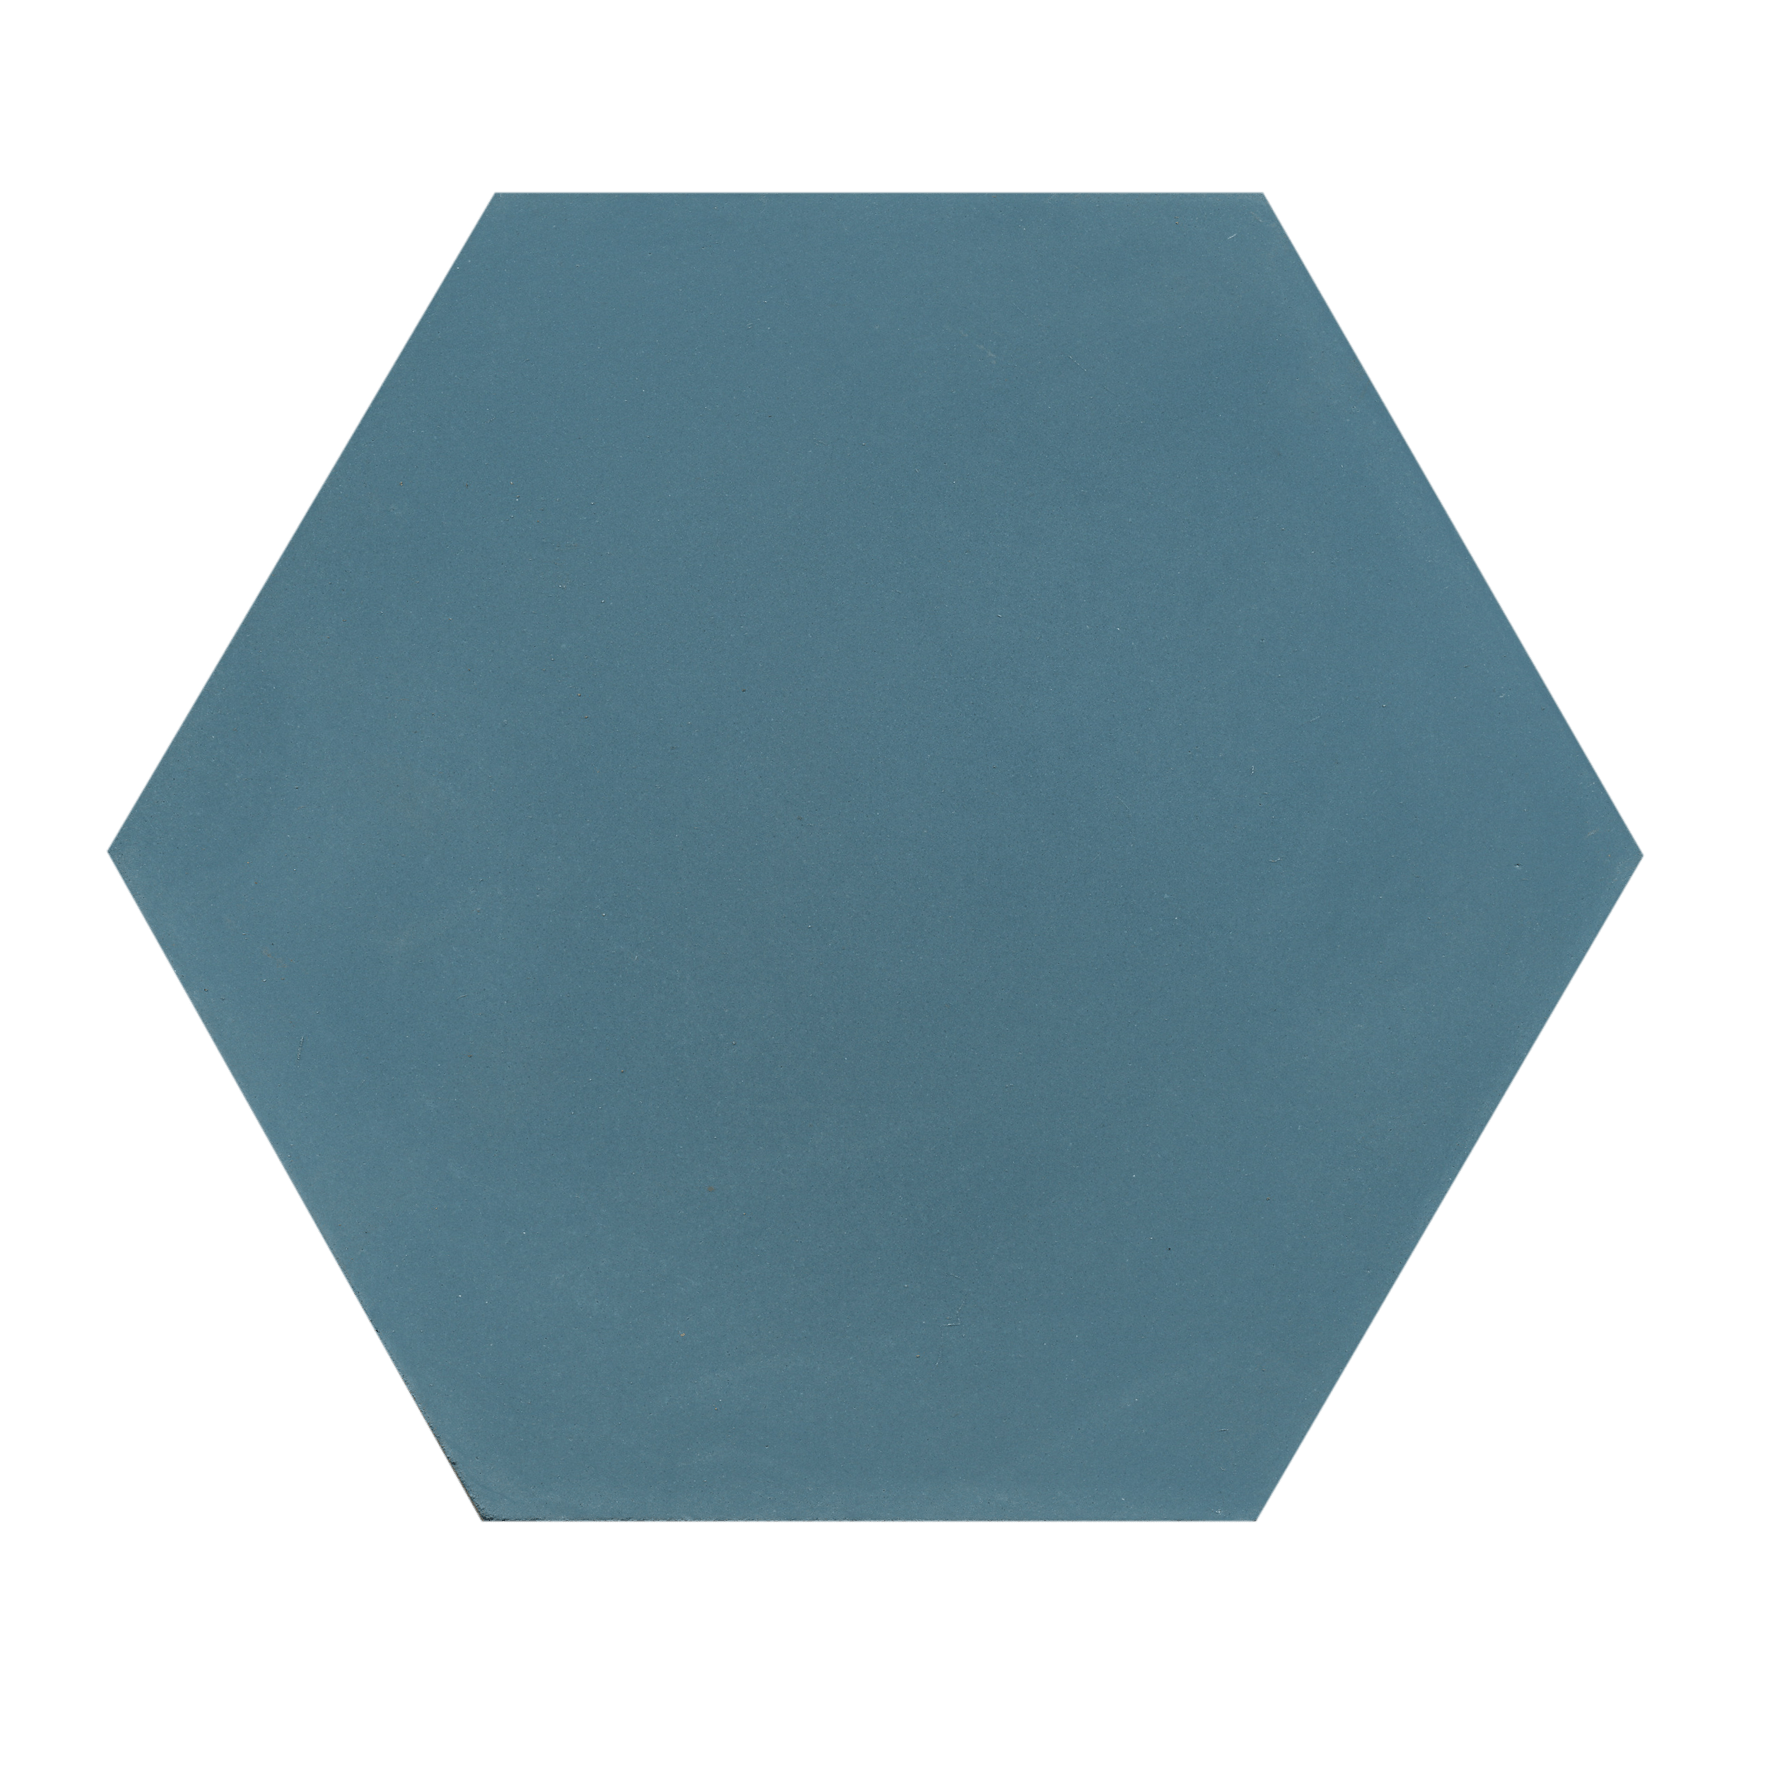 zementfliesen-terrazzofliesen-kreidefarbe-terrazzo-fugenlos-viaplatten-6-40 | 6-40